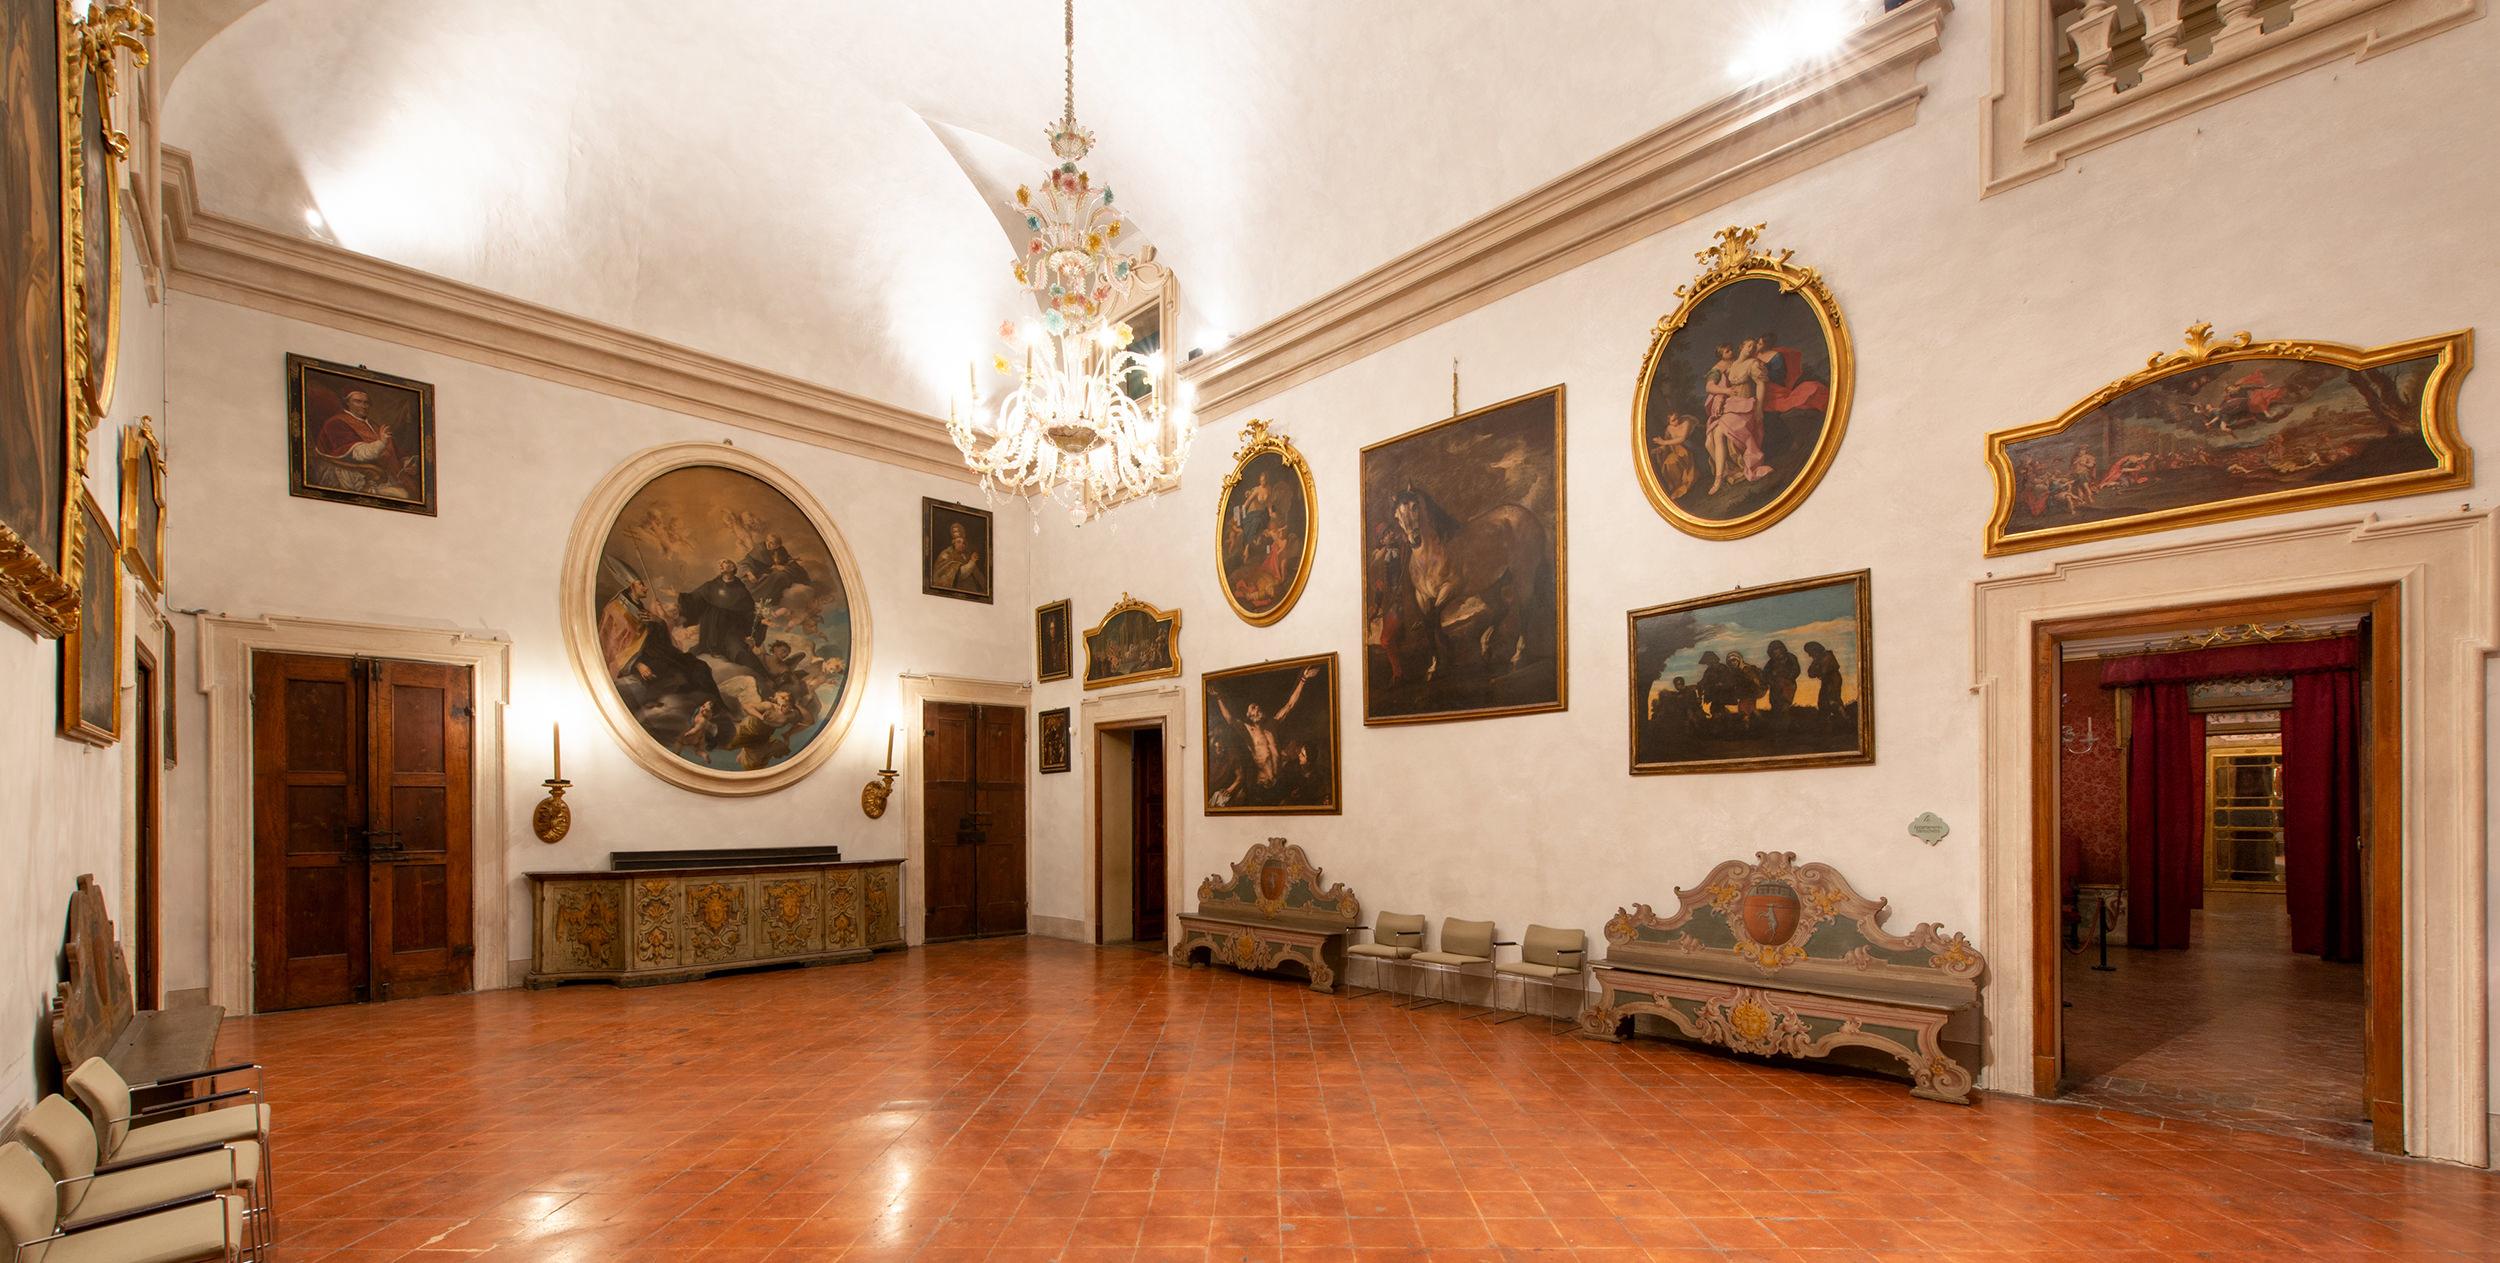 Palazzo_Tozzoni_180802_037.jpg